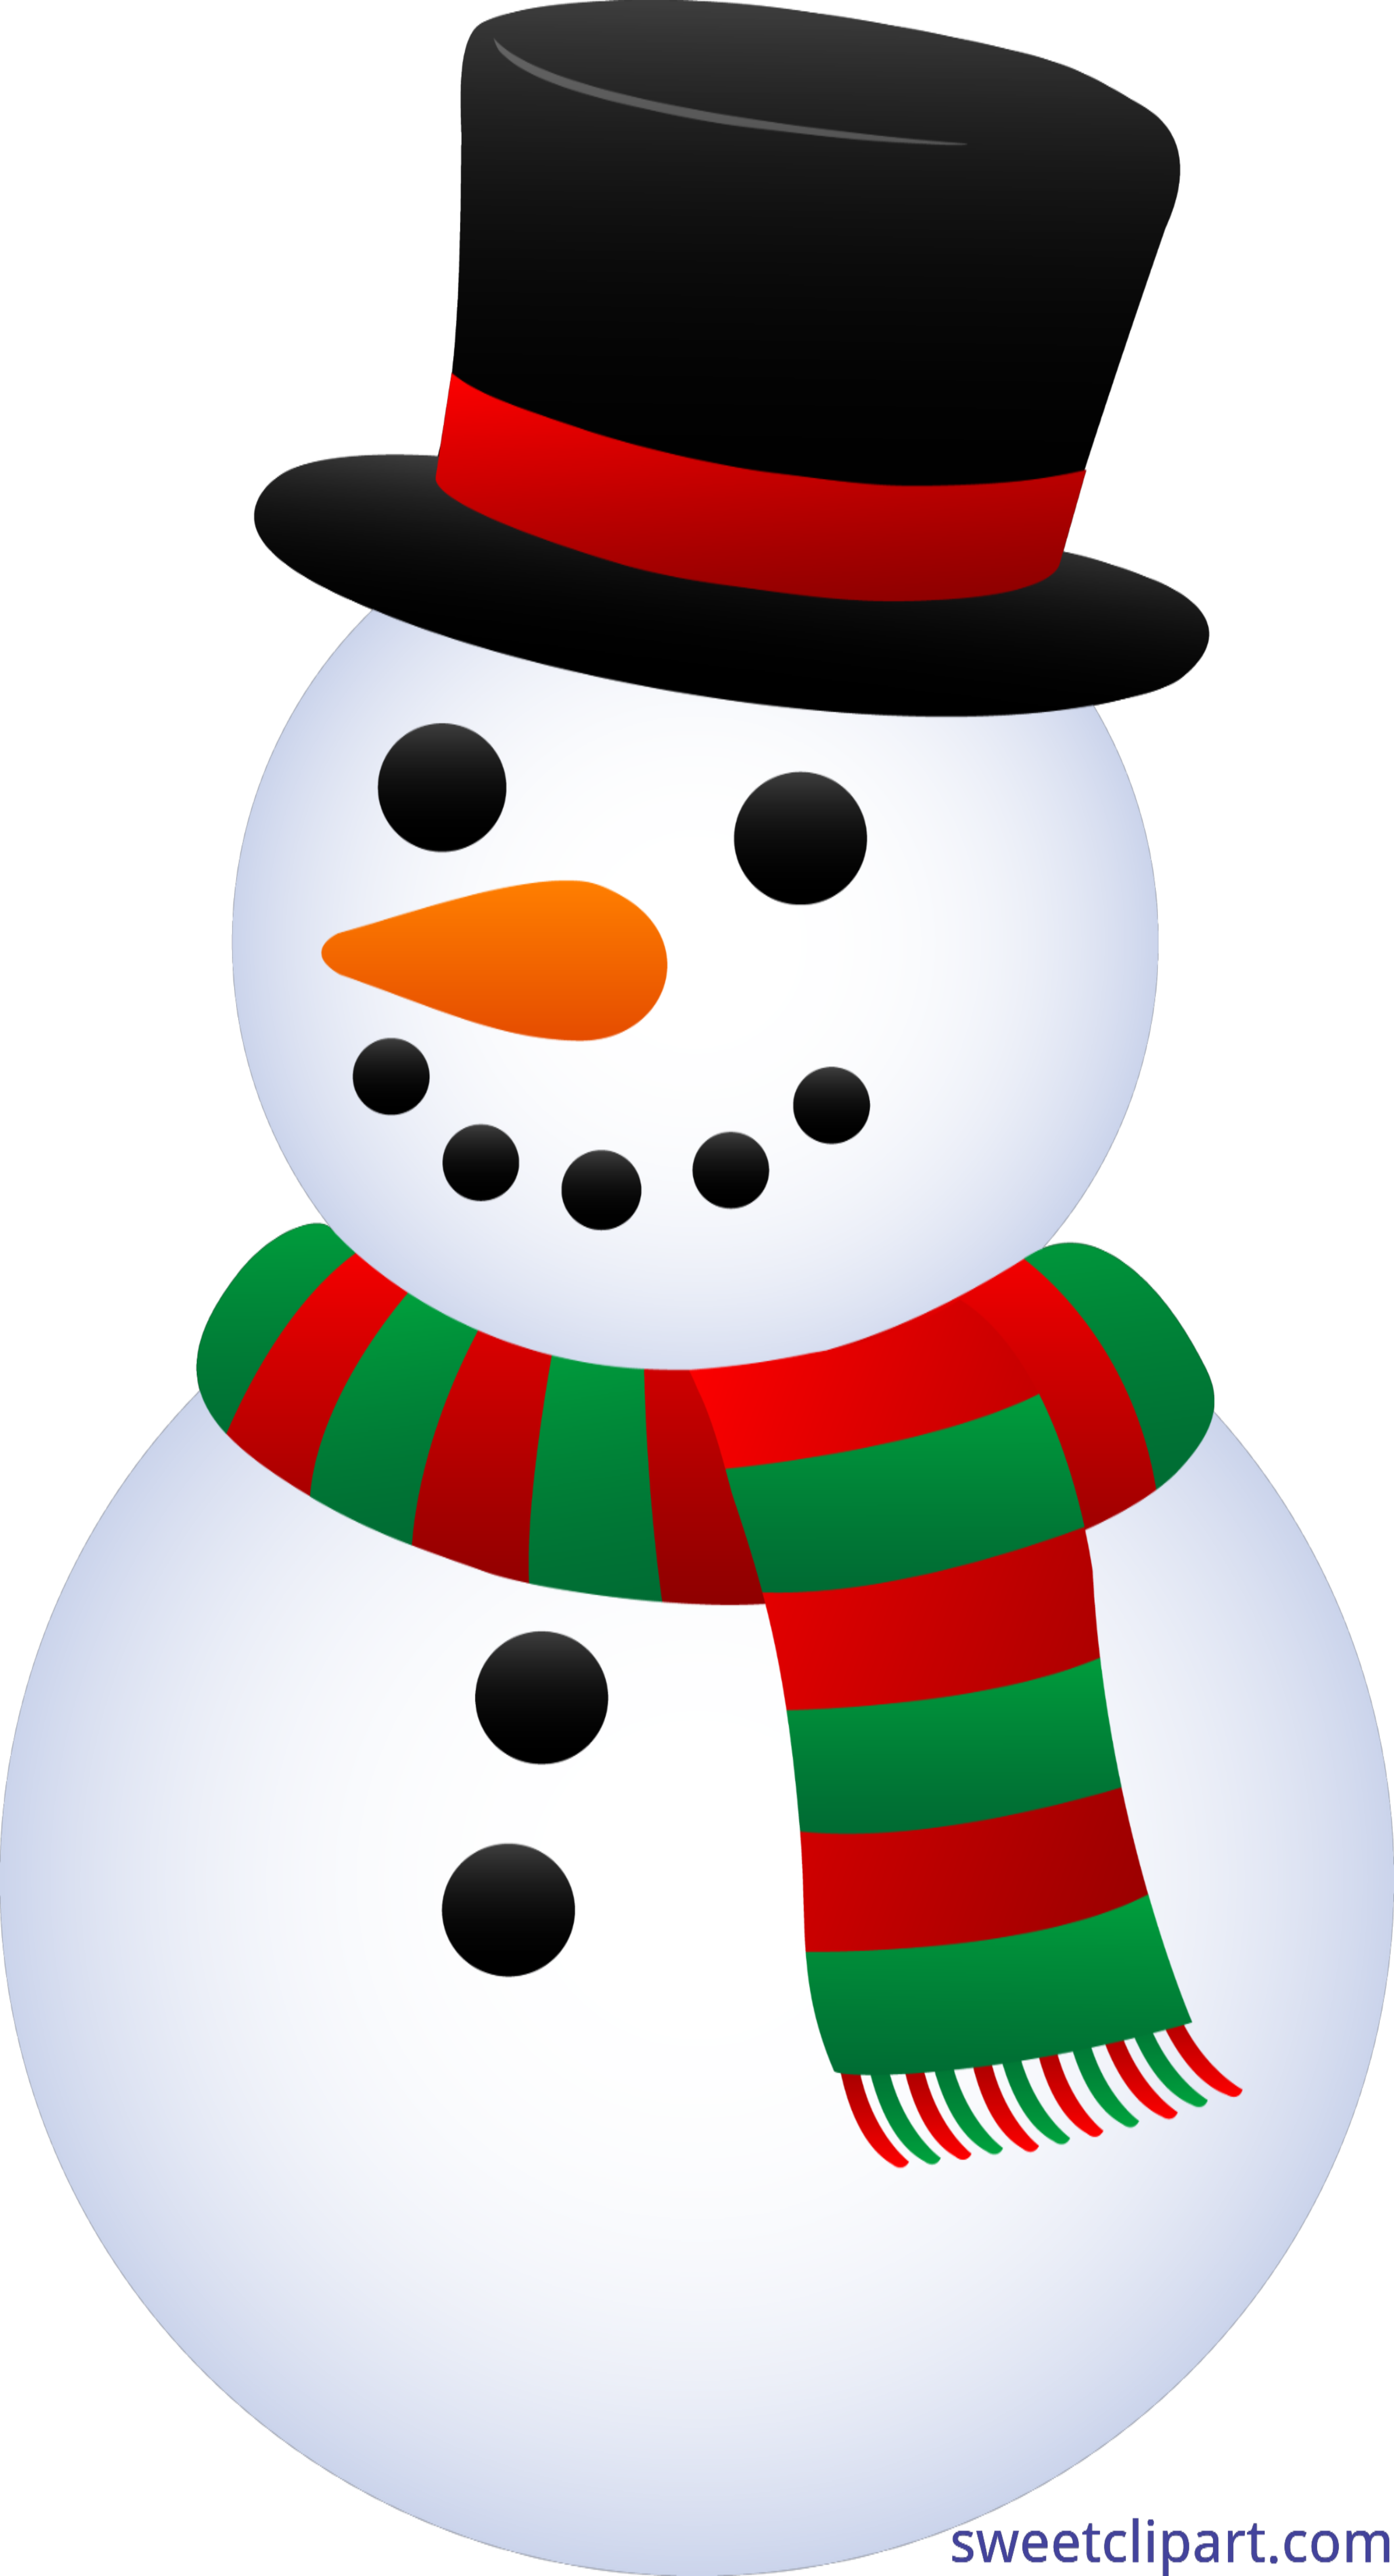 christmas snowman clip art sweet clip art rh m sweetclipart com christmas snow man clip art Merry Christmas Snowman Clip Art